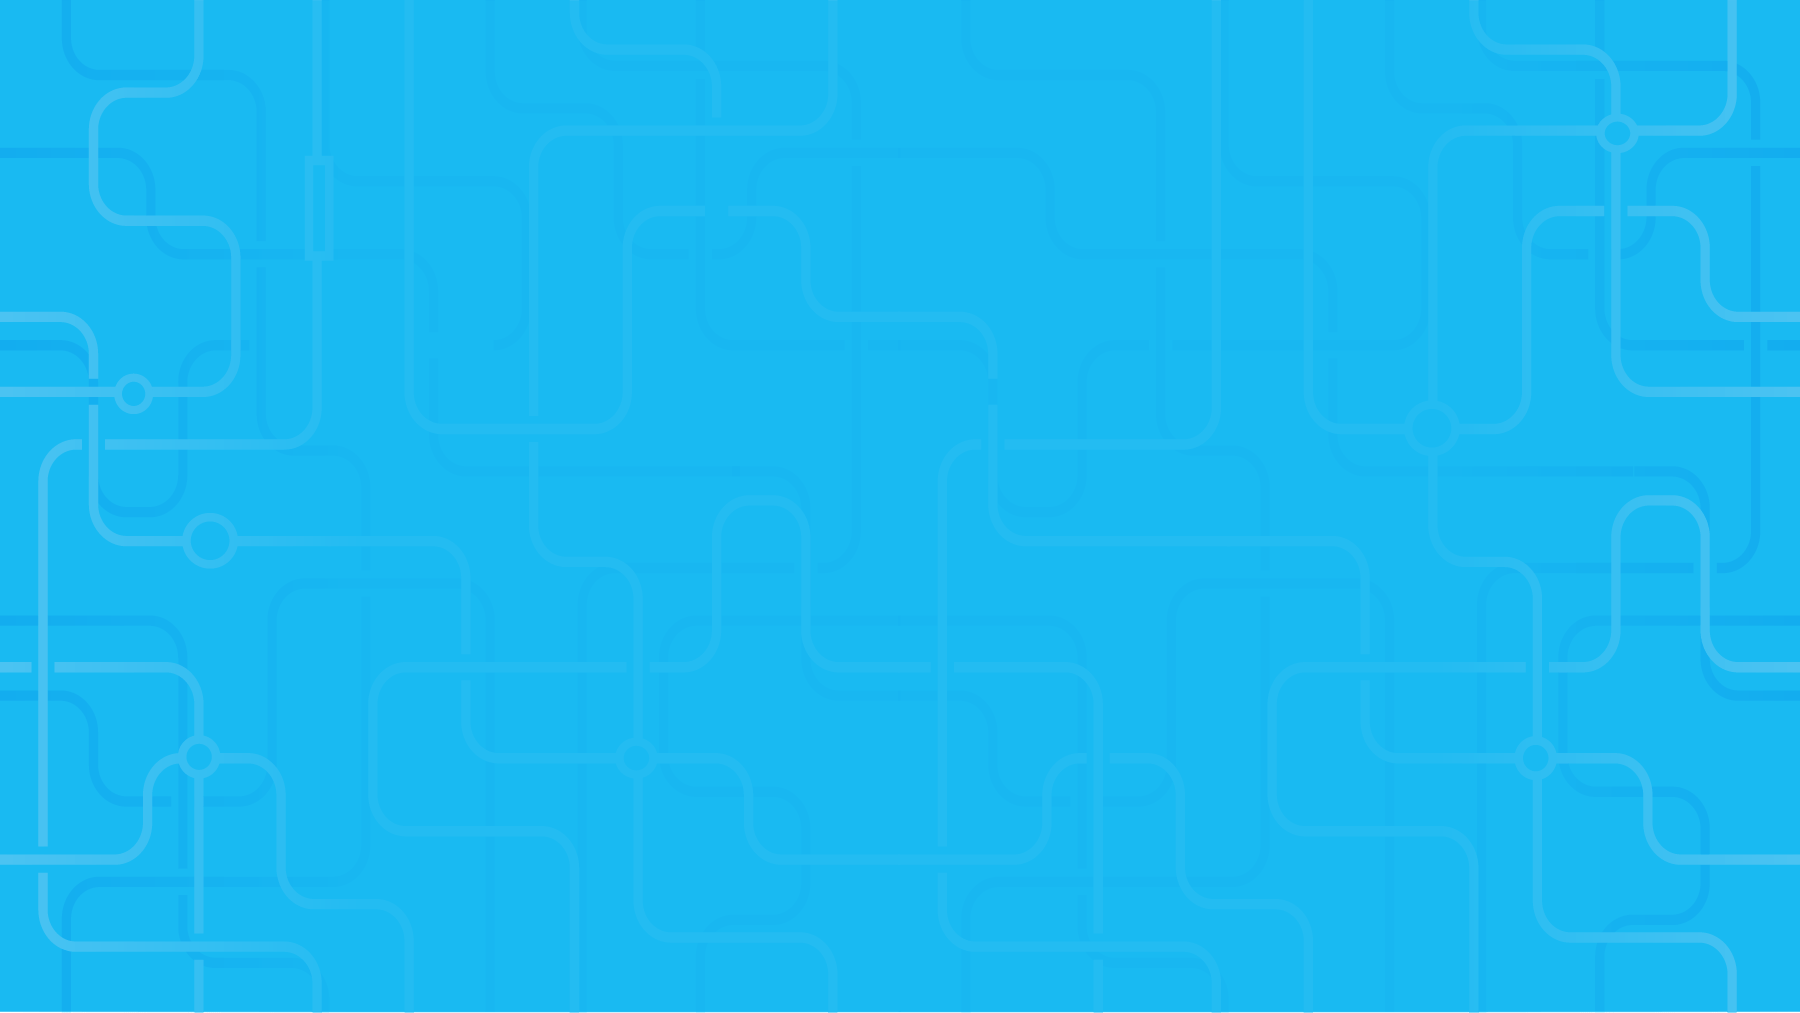 blue%20seamless%20wire%20pattern%20background